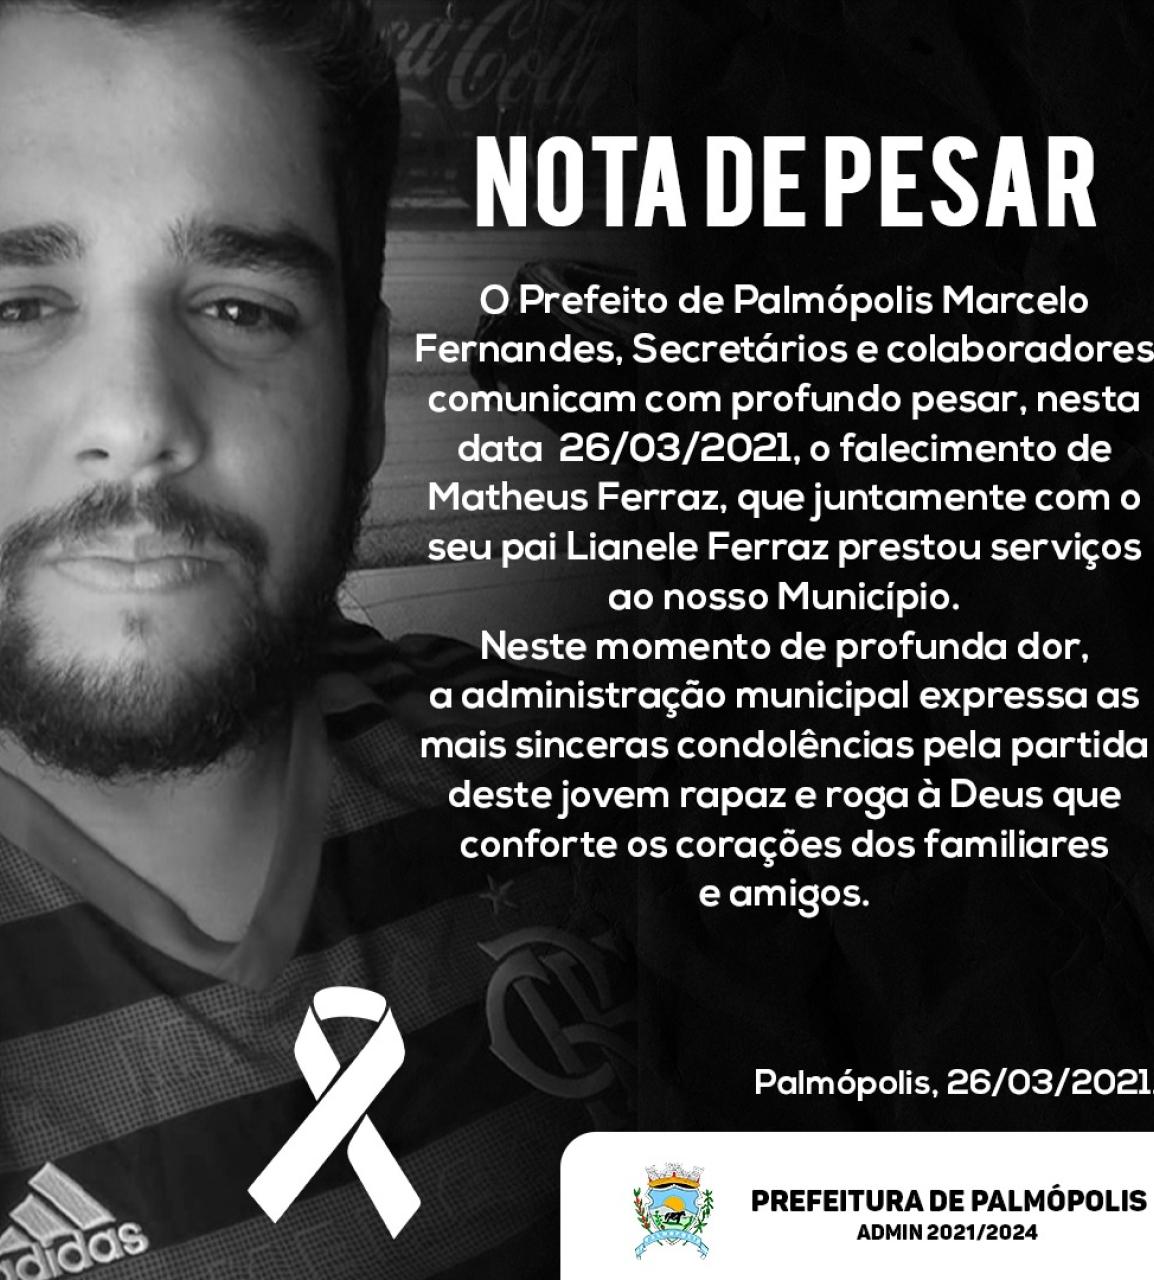 Nota de Pesar - Matheus Ferraz